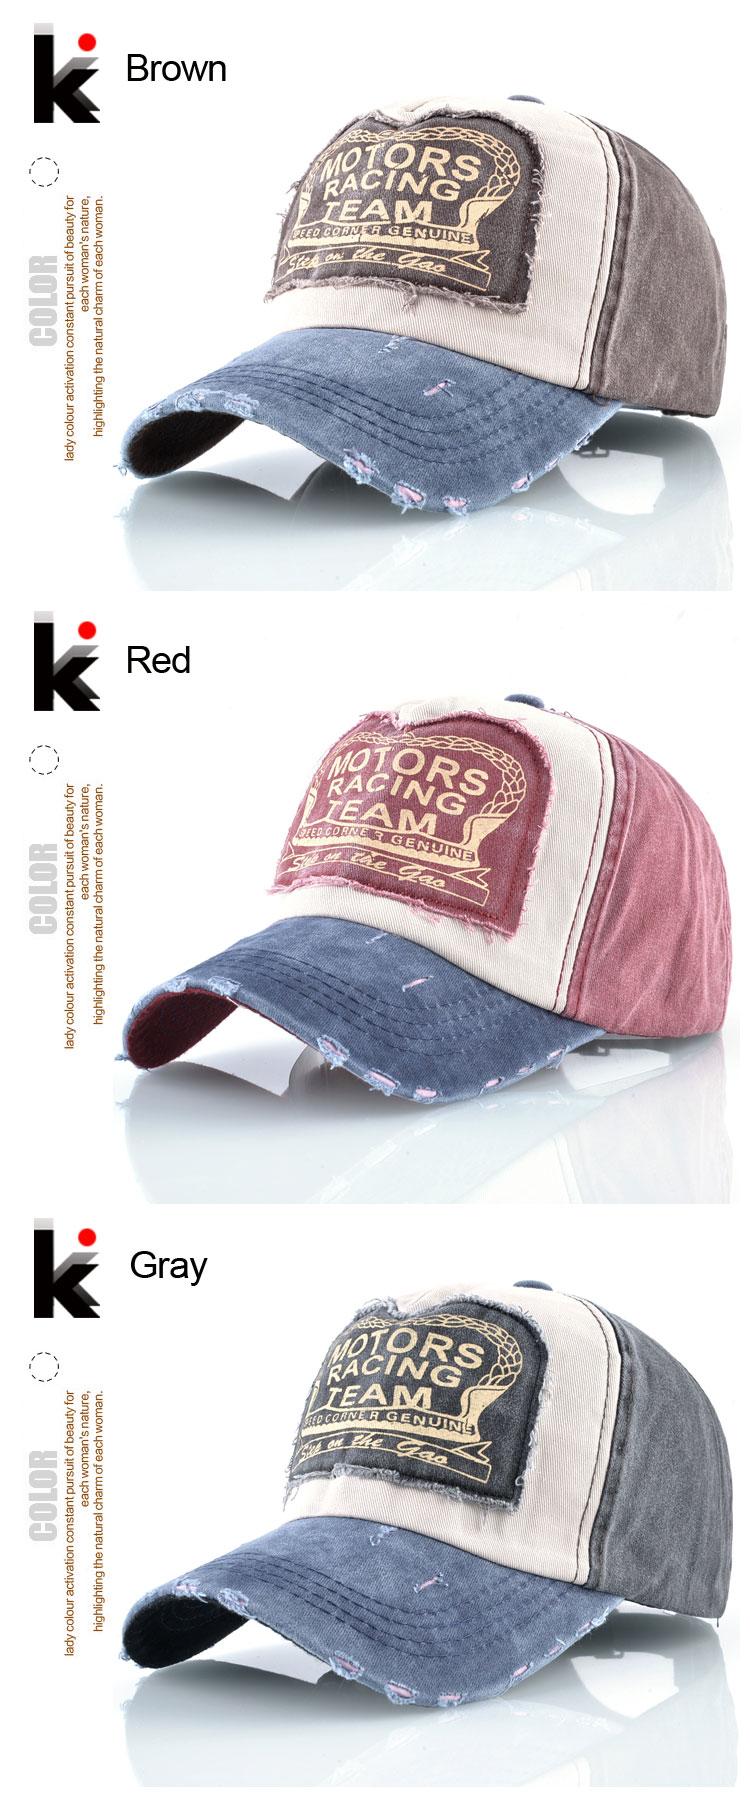 Fashion Washed Denim Baseball Cap Women Snapback Patch Hip Hop Hats For Men  Spring Summer Streetwear Fitted Cap Brand Cotton Hat cbd09c91c5f2